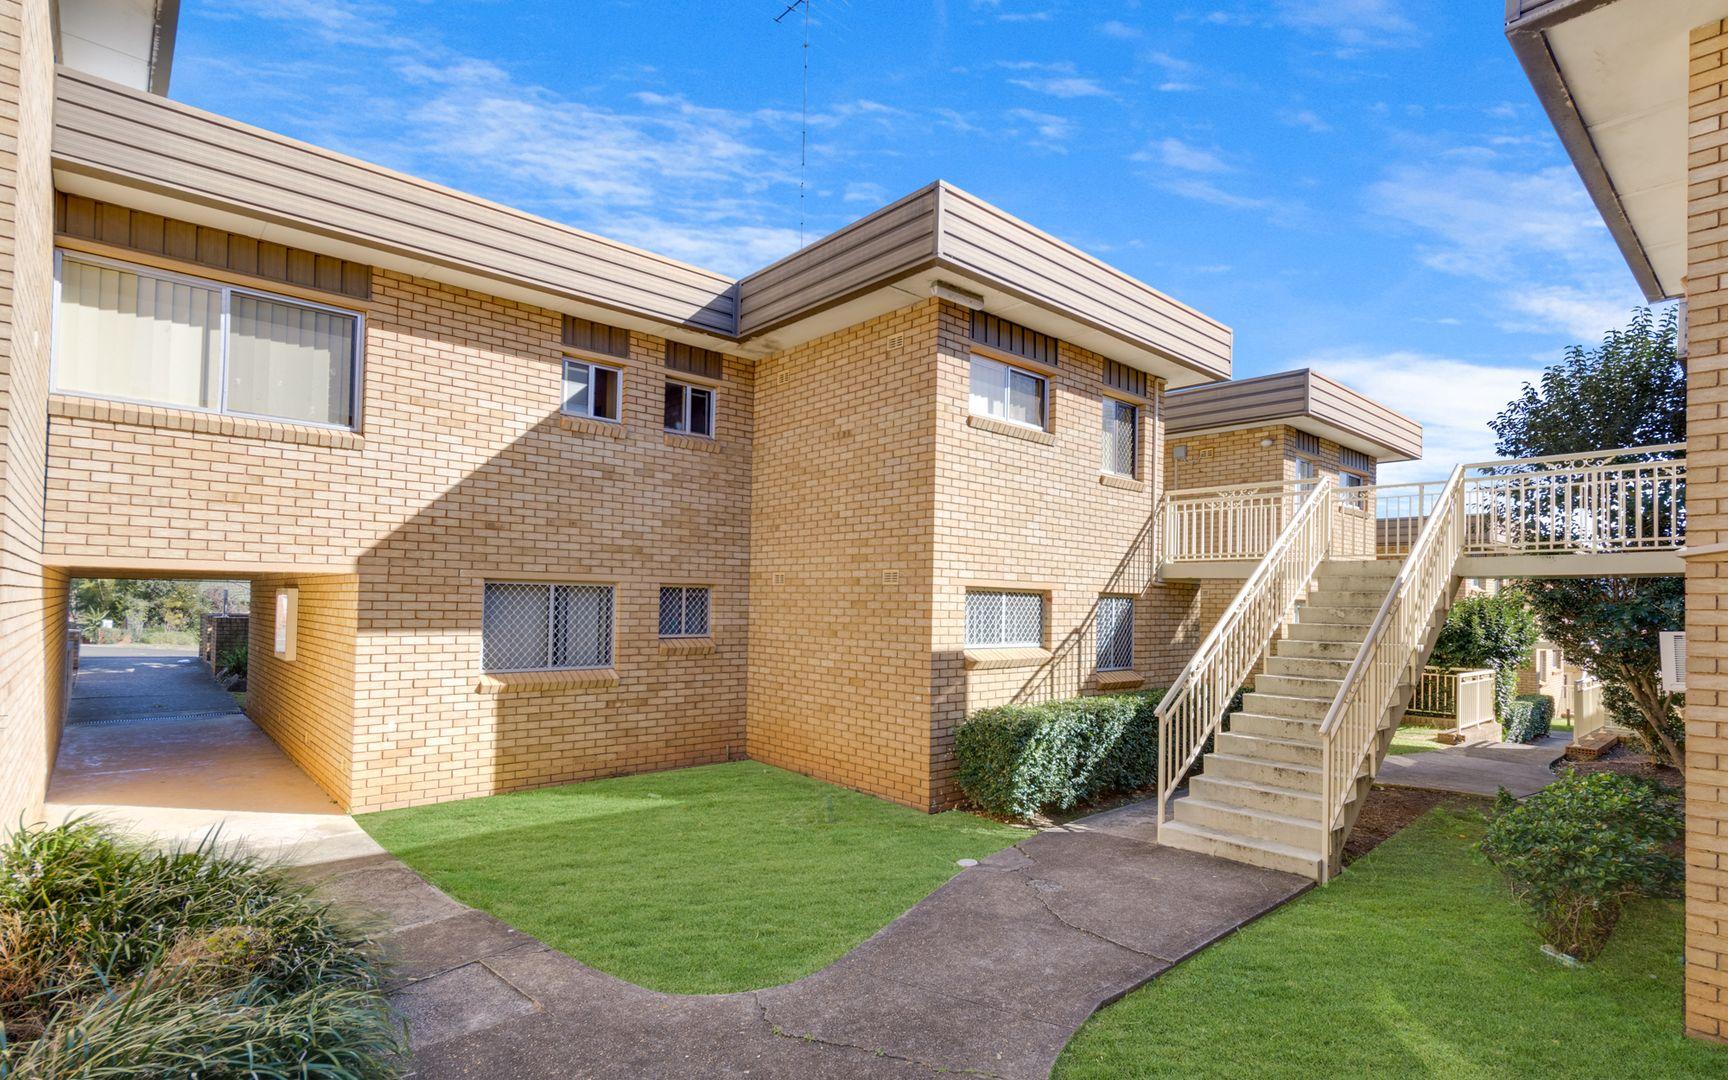 13/20-30 Condamine Street, Campbelltown NSW 2560, Image 1